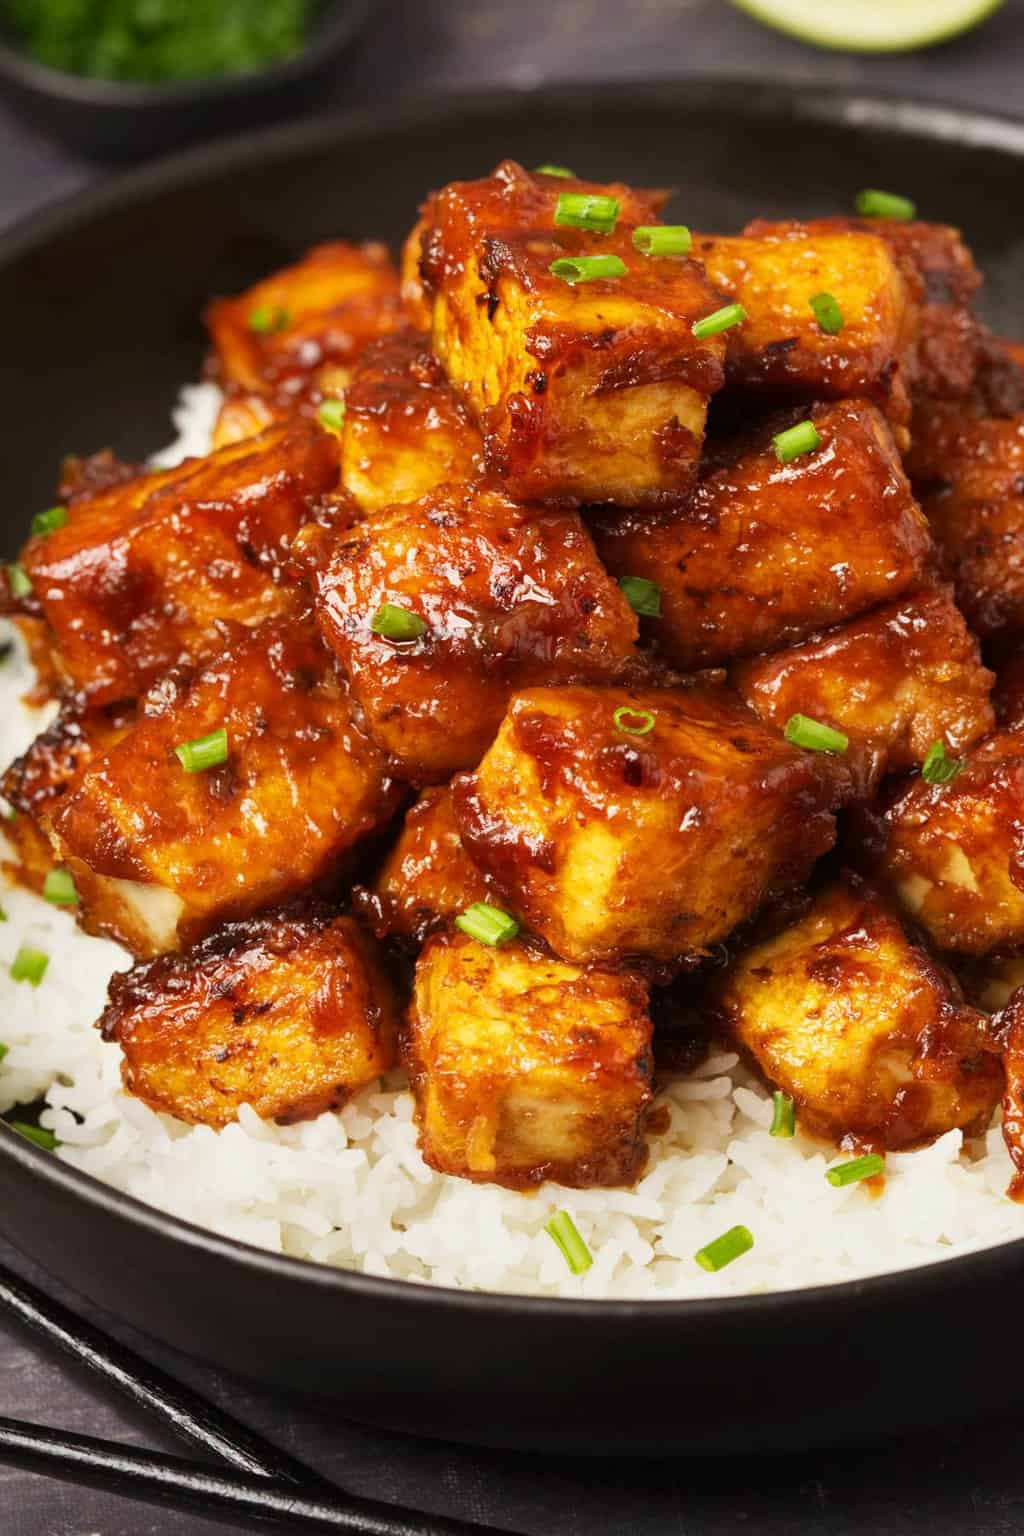 Sojakäse mit leckerer Soße vegan